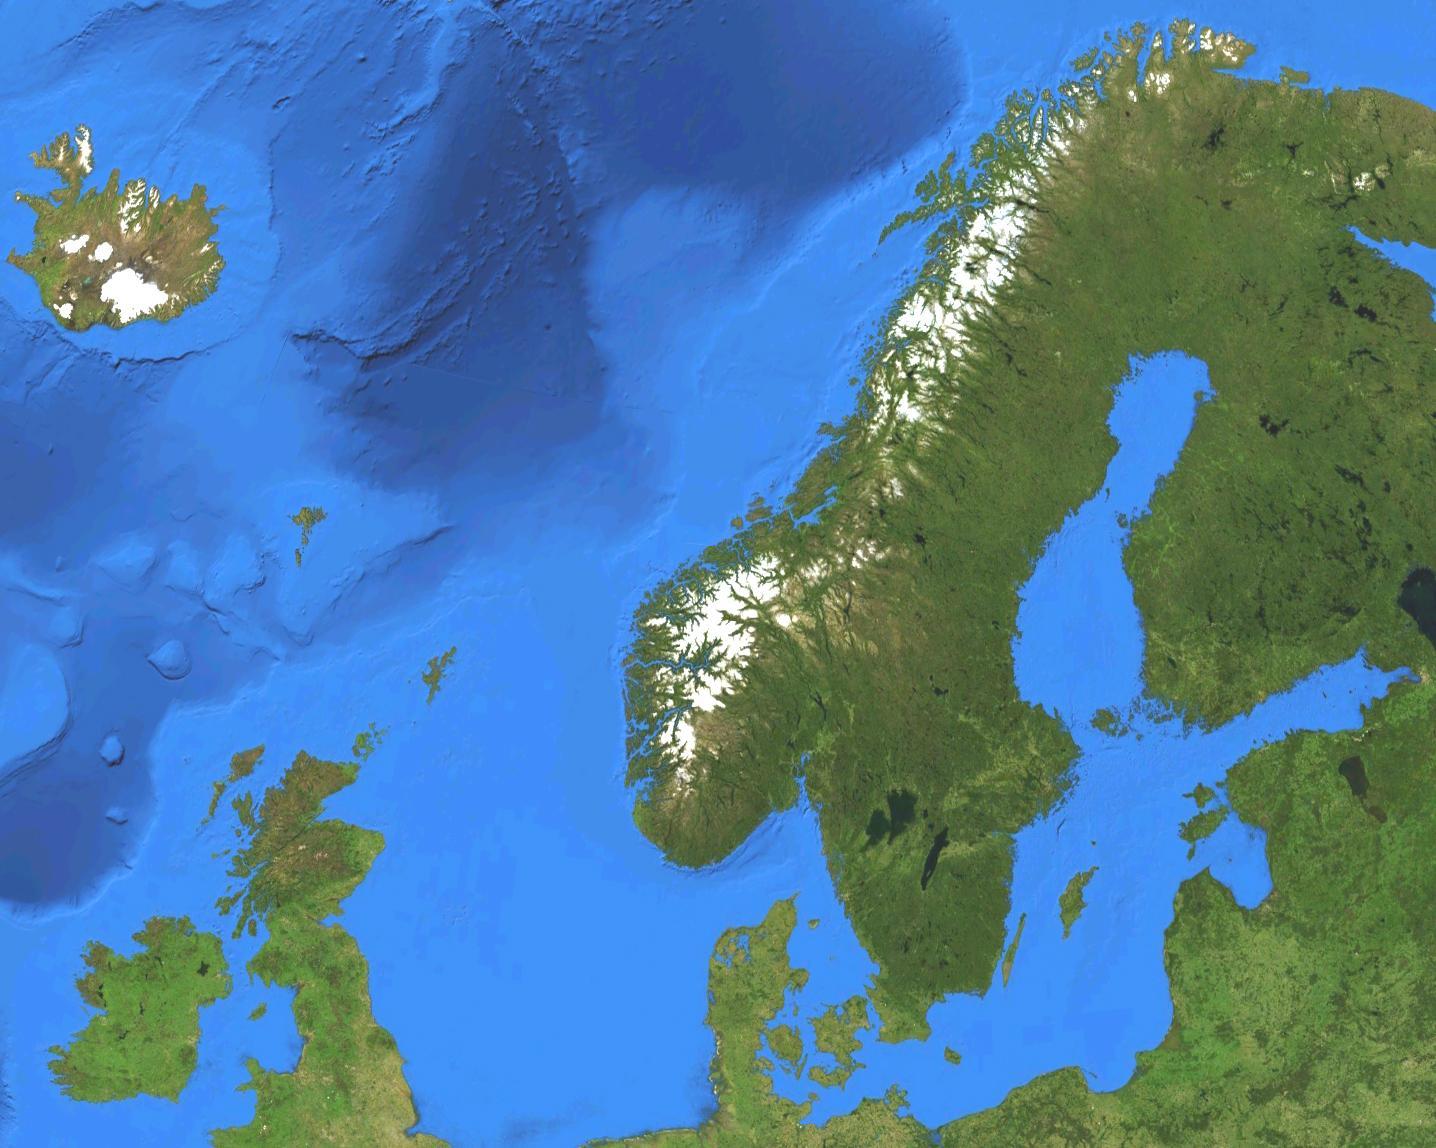 Norvegia Harta Prin Satelit Harta Norvegiei Prin Satelit Europa